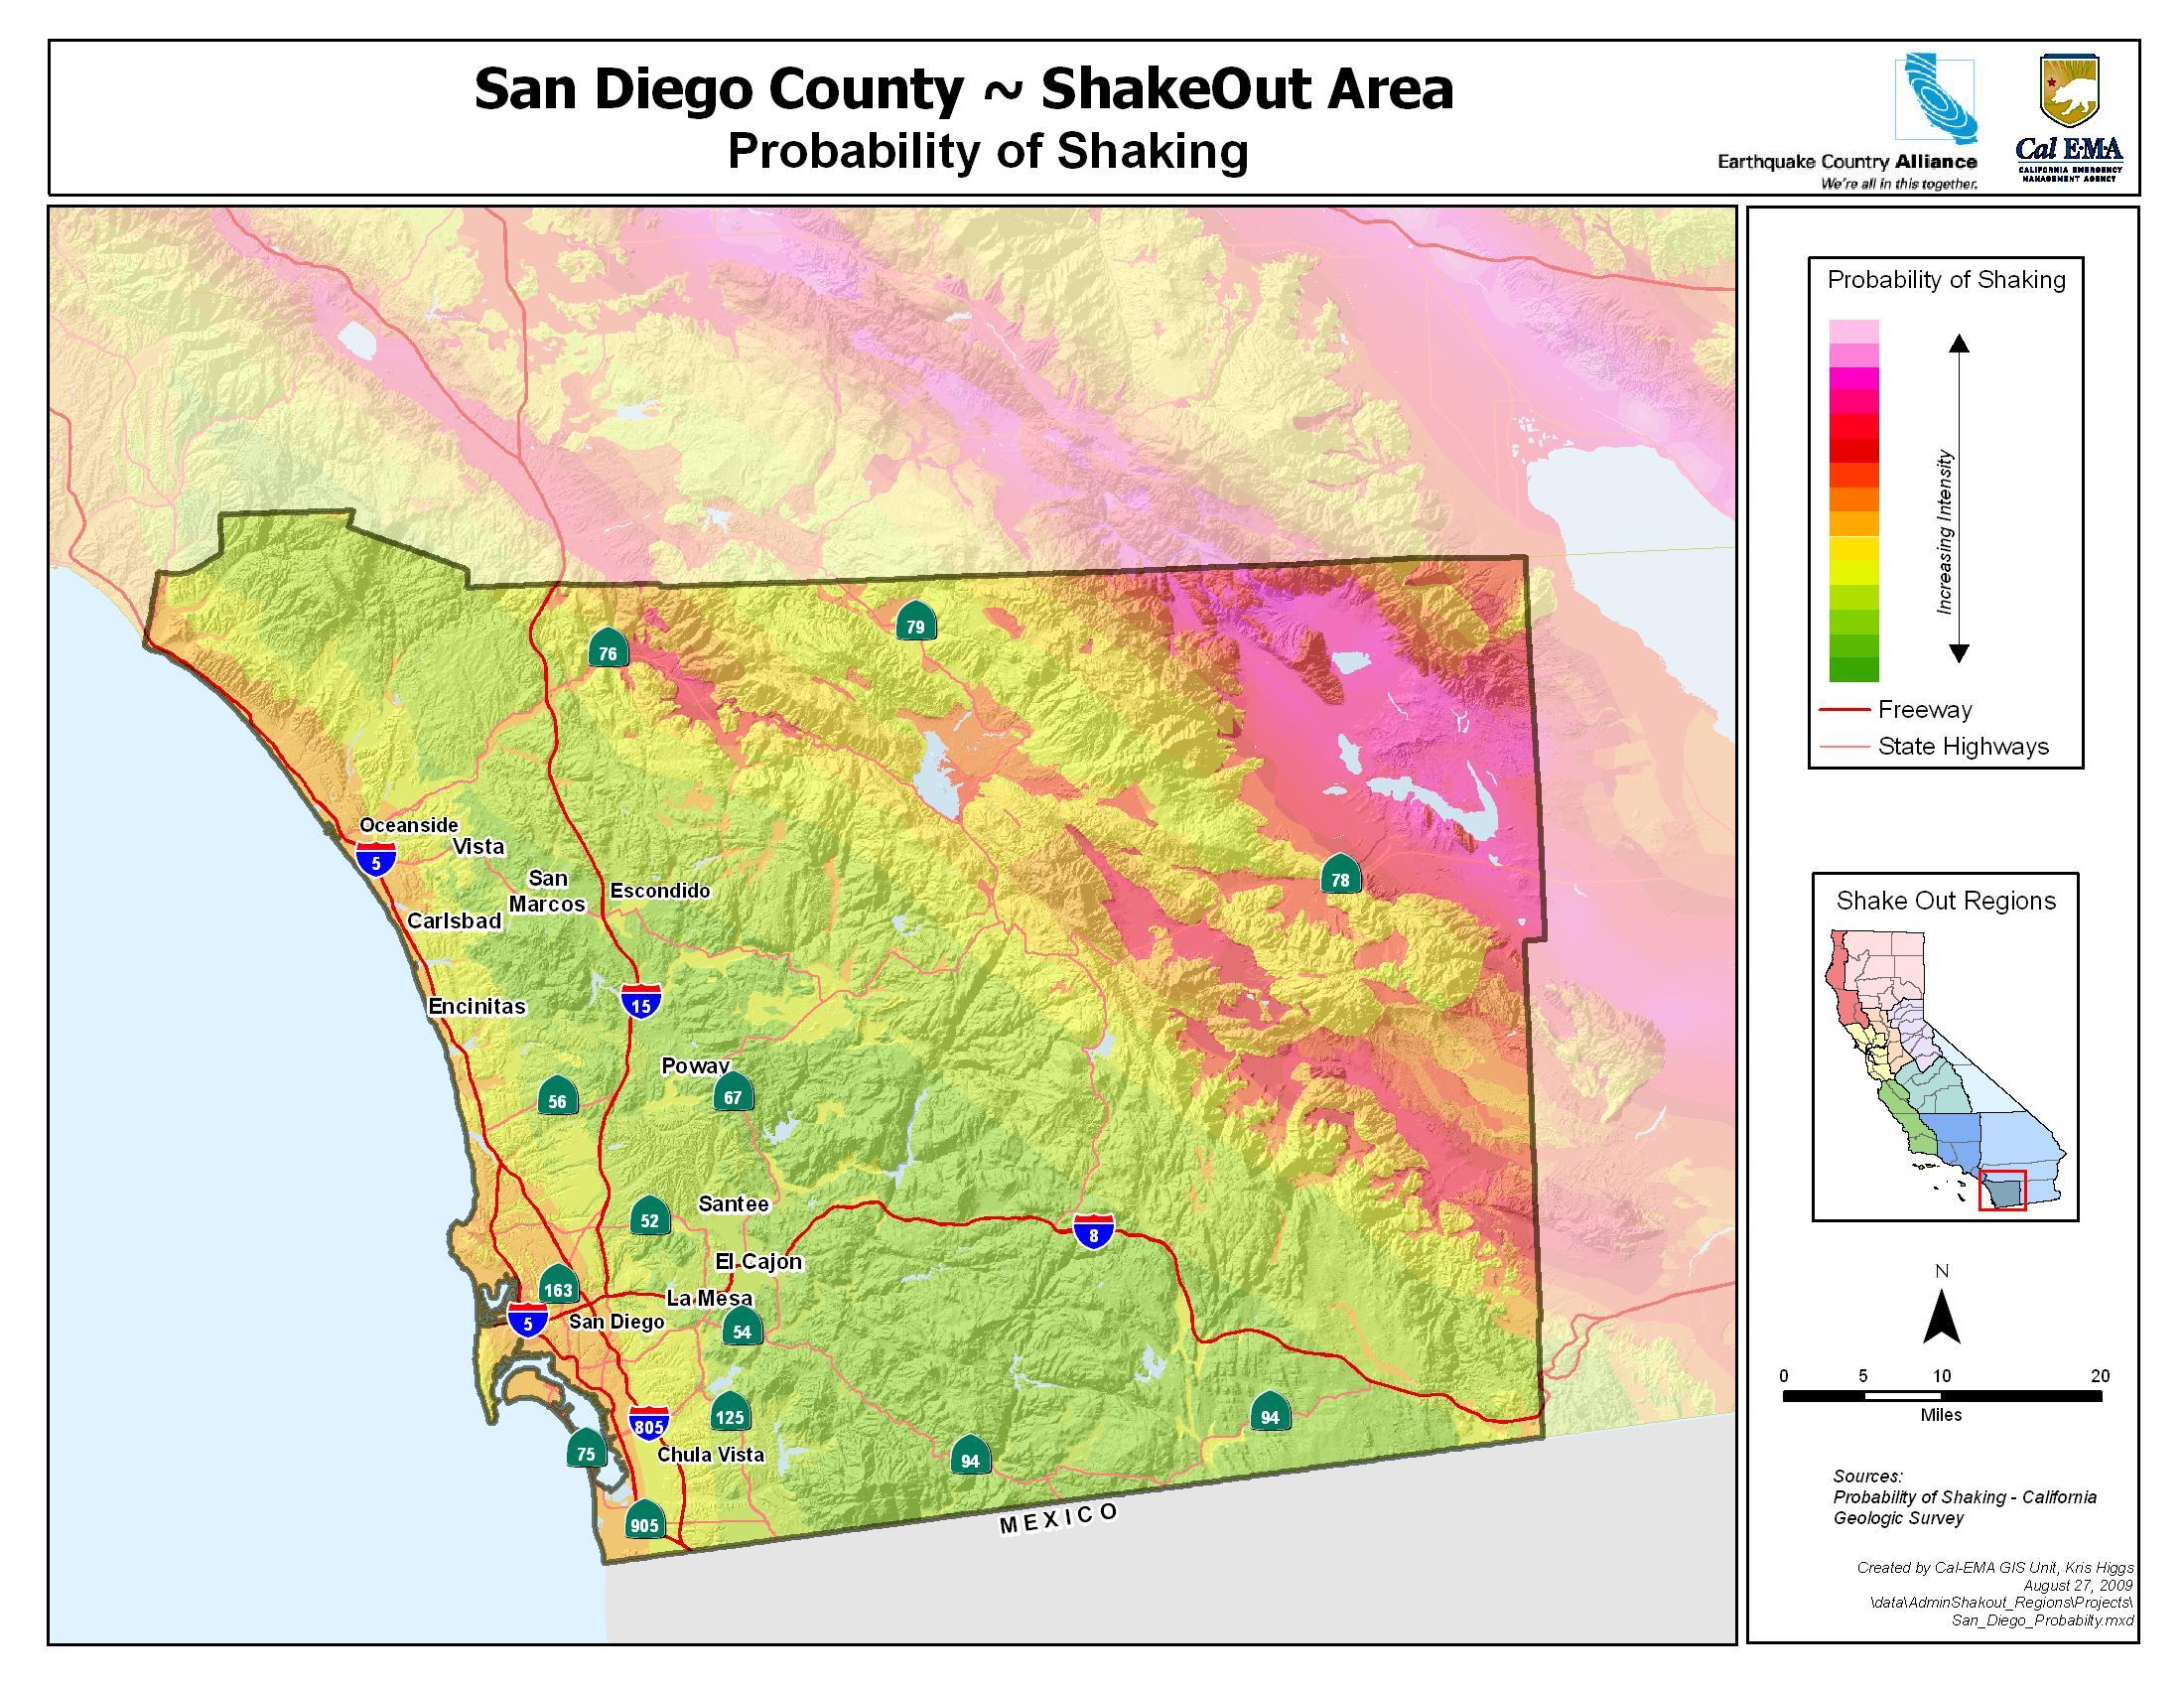 Earthquake Country Alliance: Earthquake Country Alliance